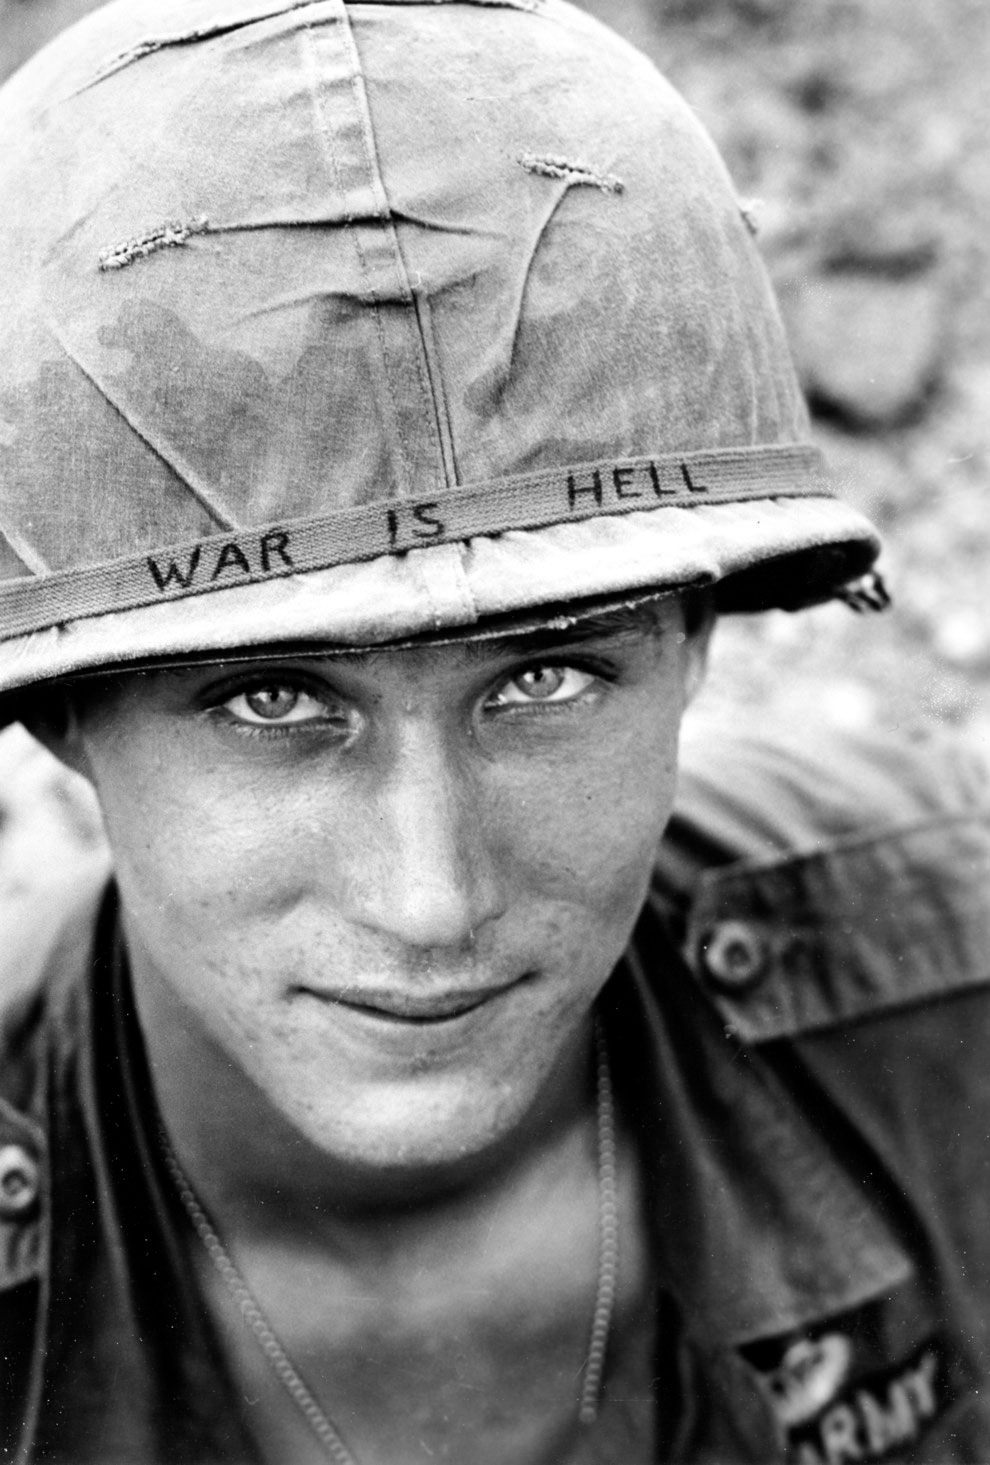 razboiul-e-iad-1965-war-is-hell